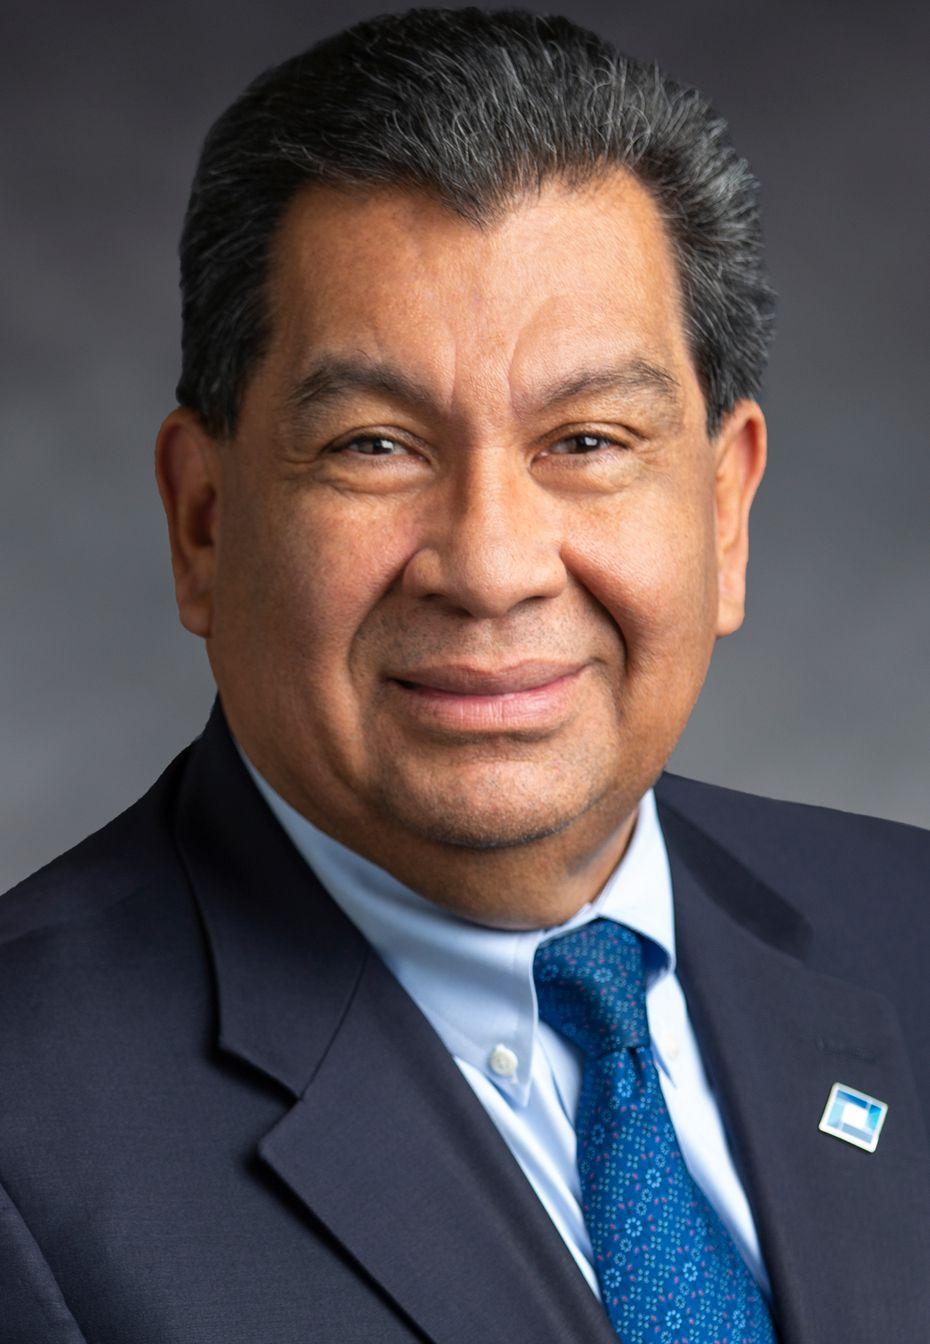 Dr. Alejandro Arroliga is the chief medical officer of Baylor, Scott & White Health